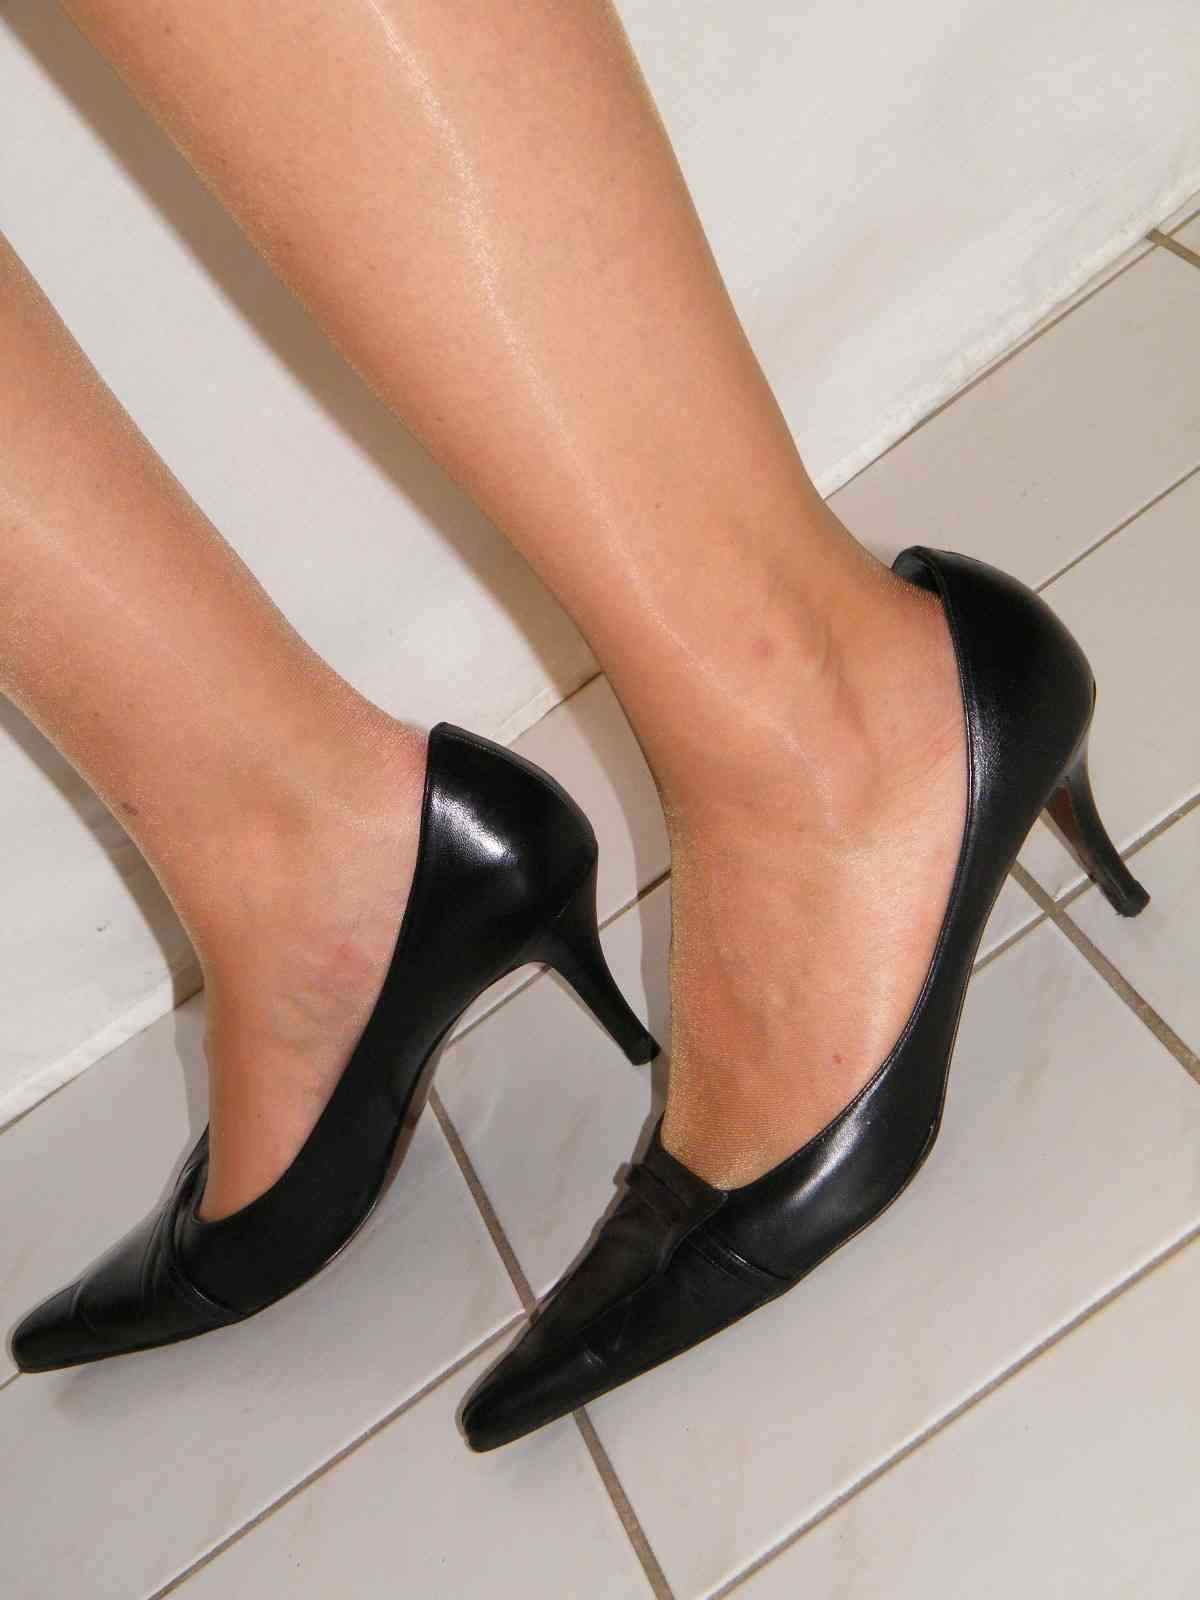 ORIGINAL WALTER STEIGER 8cm Echtleder Pumps Stiletto High Heels - black Gr.41+